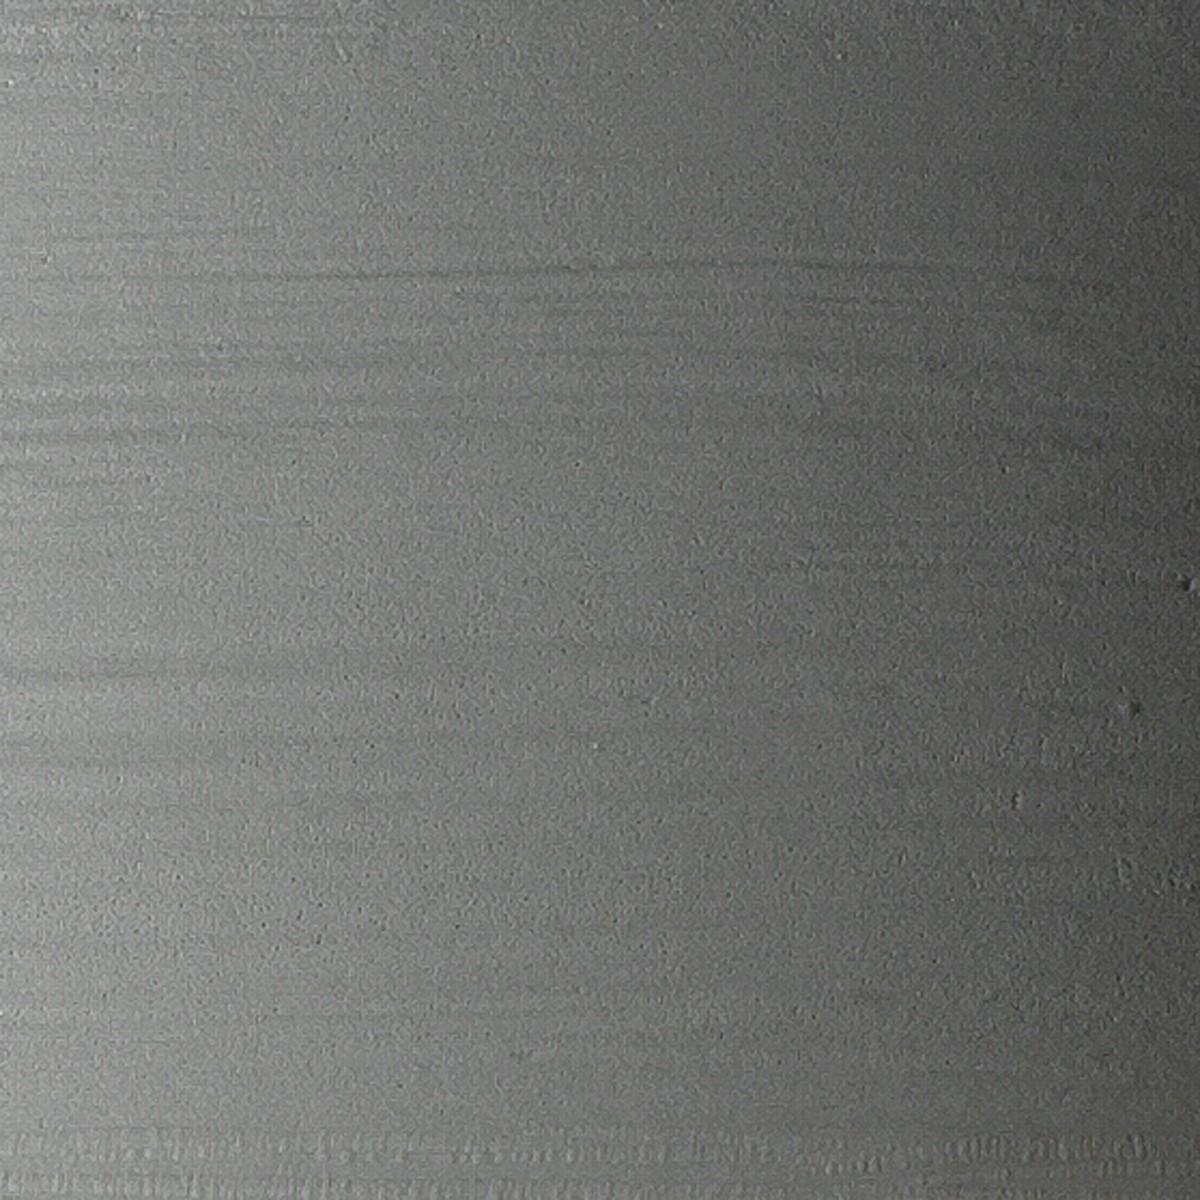 Marset Soho 38 LED Pendelleuchte, steingrau